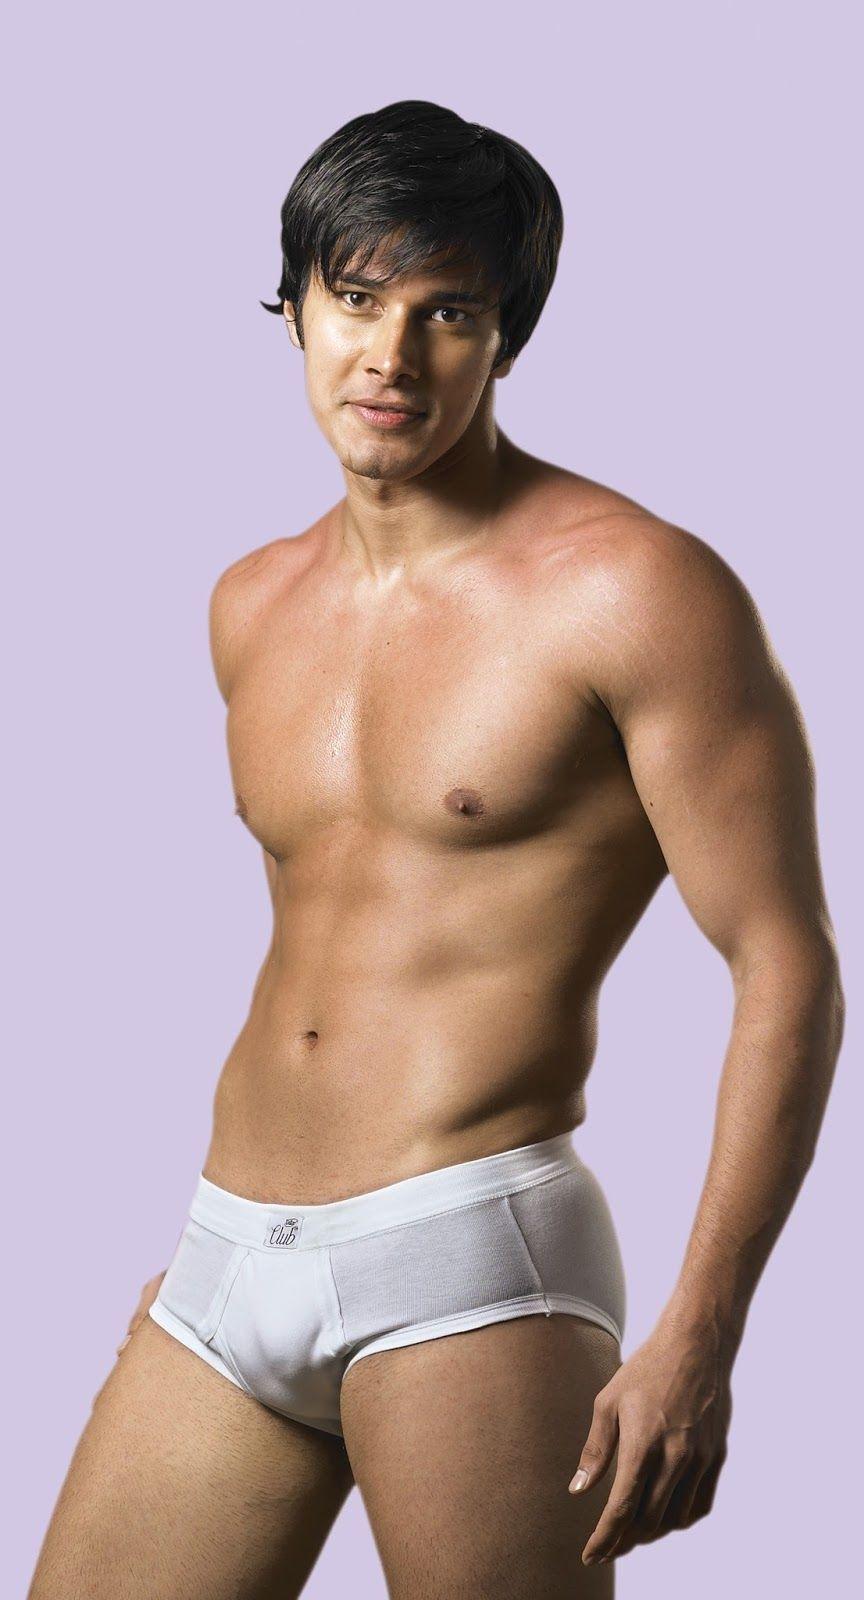 Gay underwear sex pic